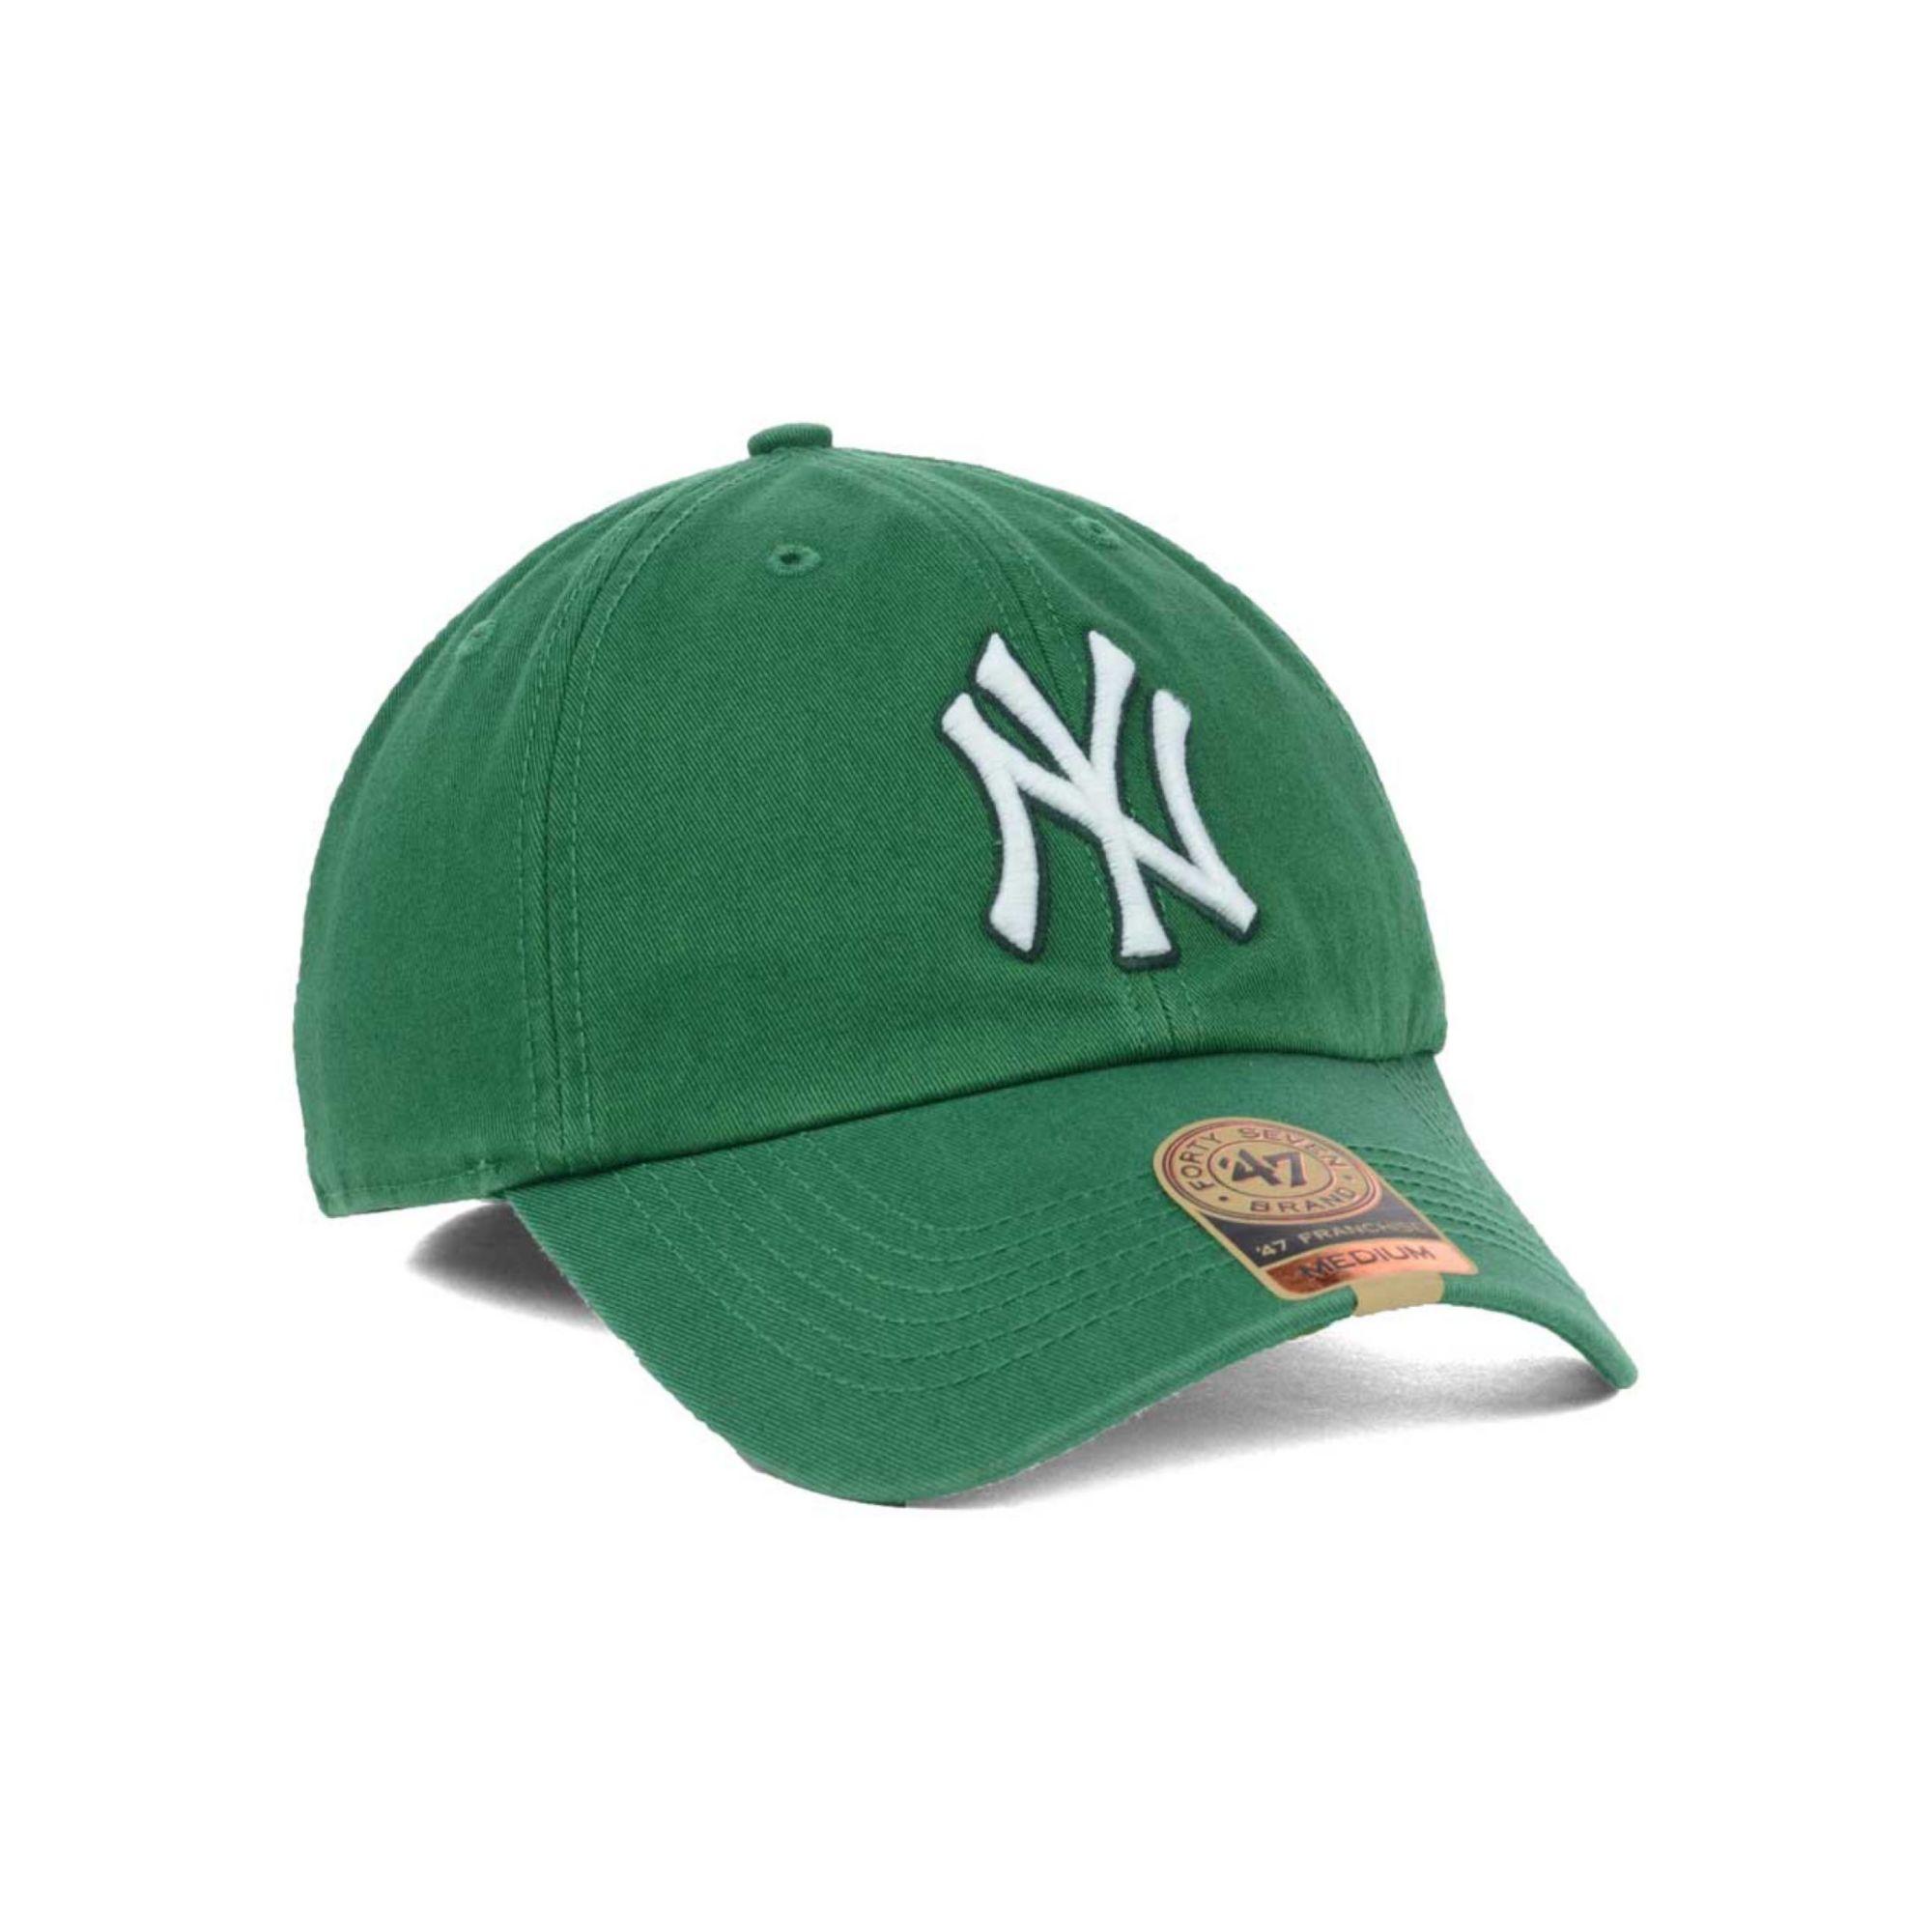 ae564226a8d62 ... usa lyst 47 brand new york yankees mlb kelly 47 franchise cap in green  e09b4 3b8dc